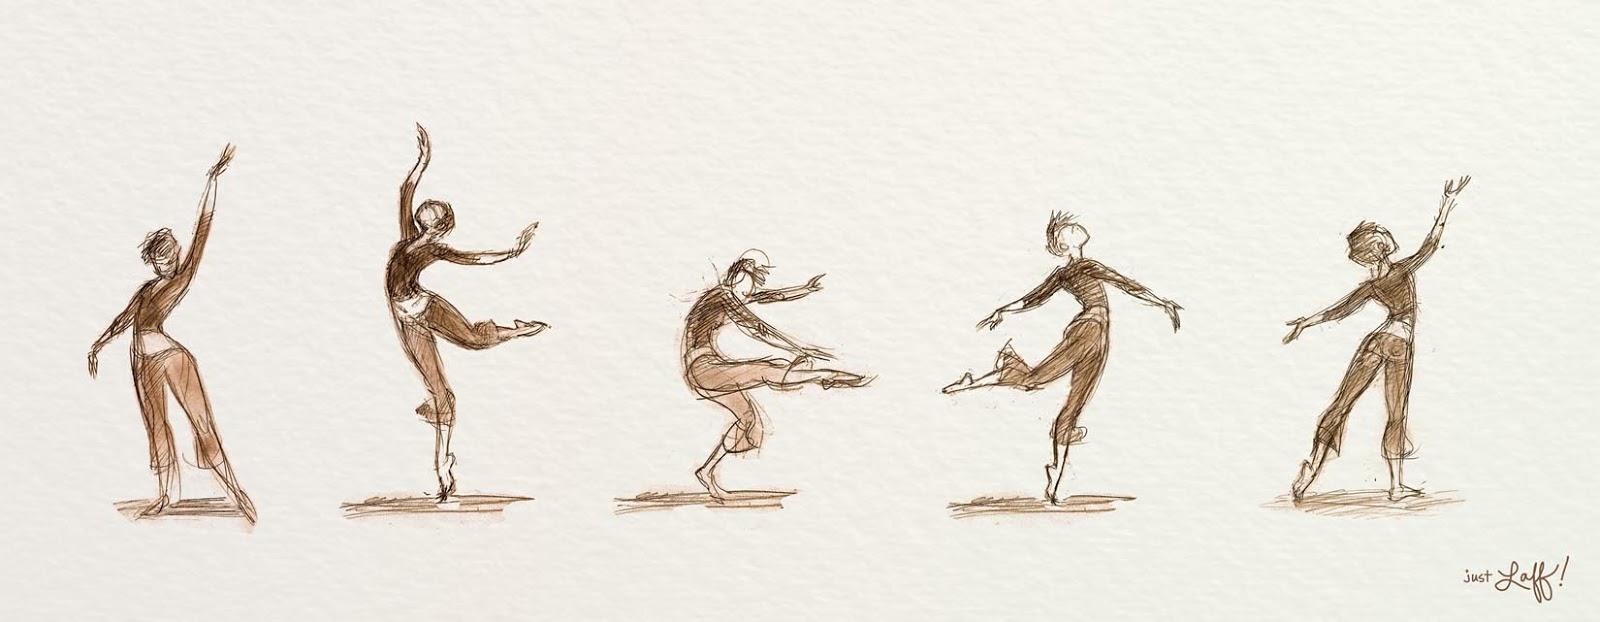 inside the beckaroo s studio 06 17 13 dancing drawings